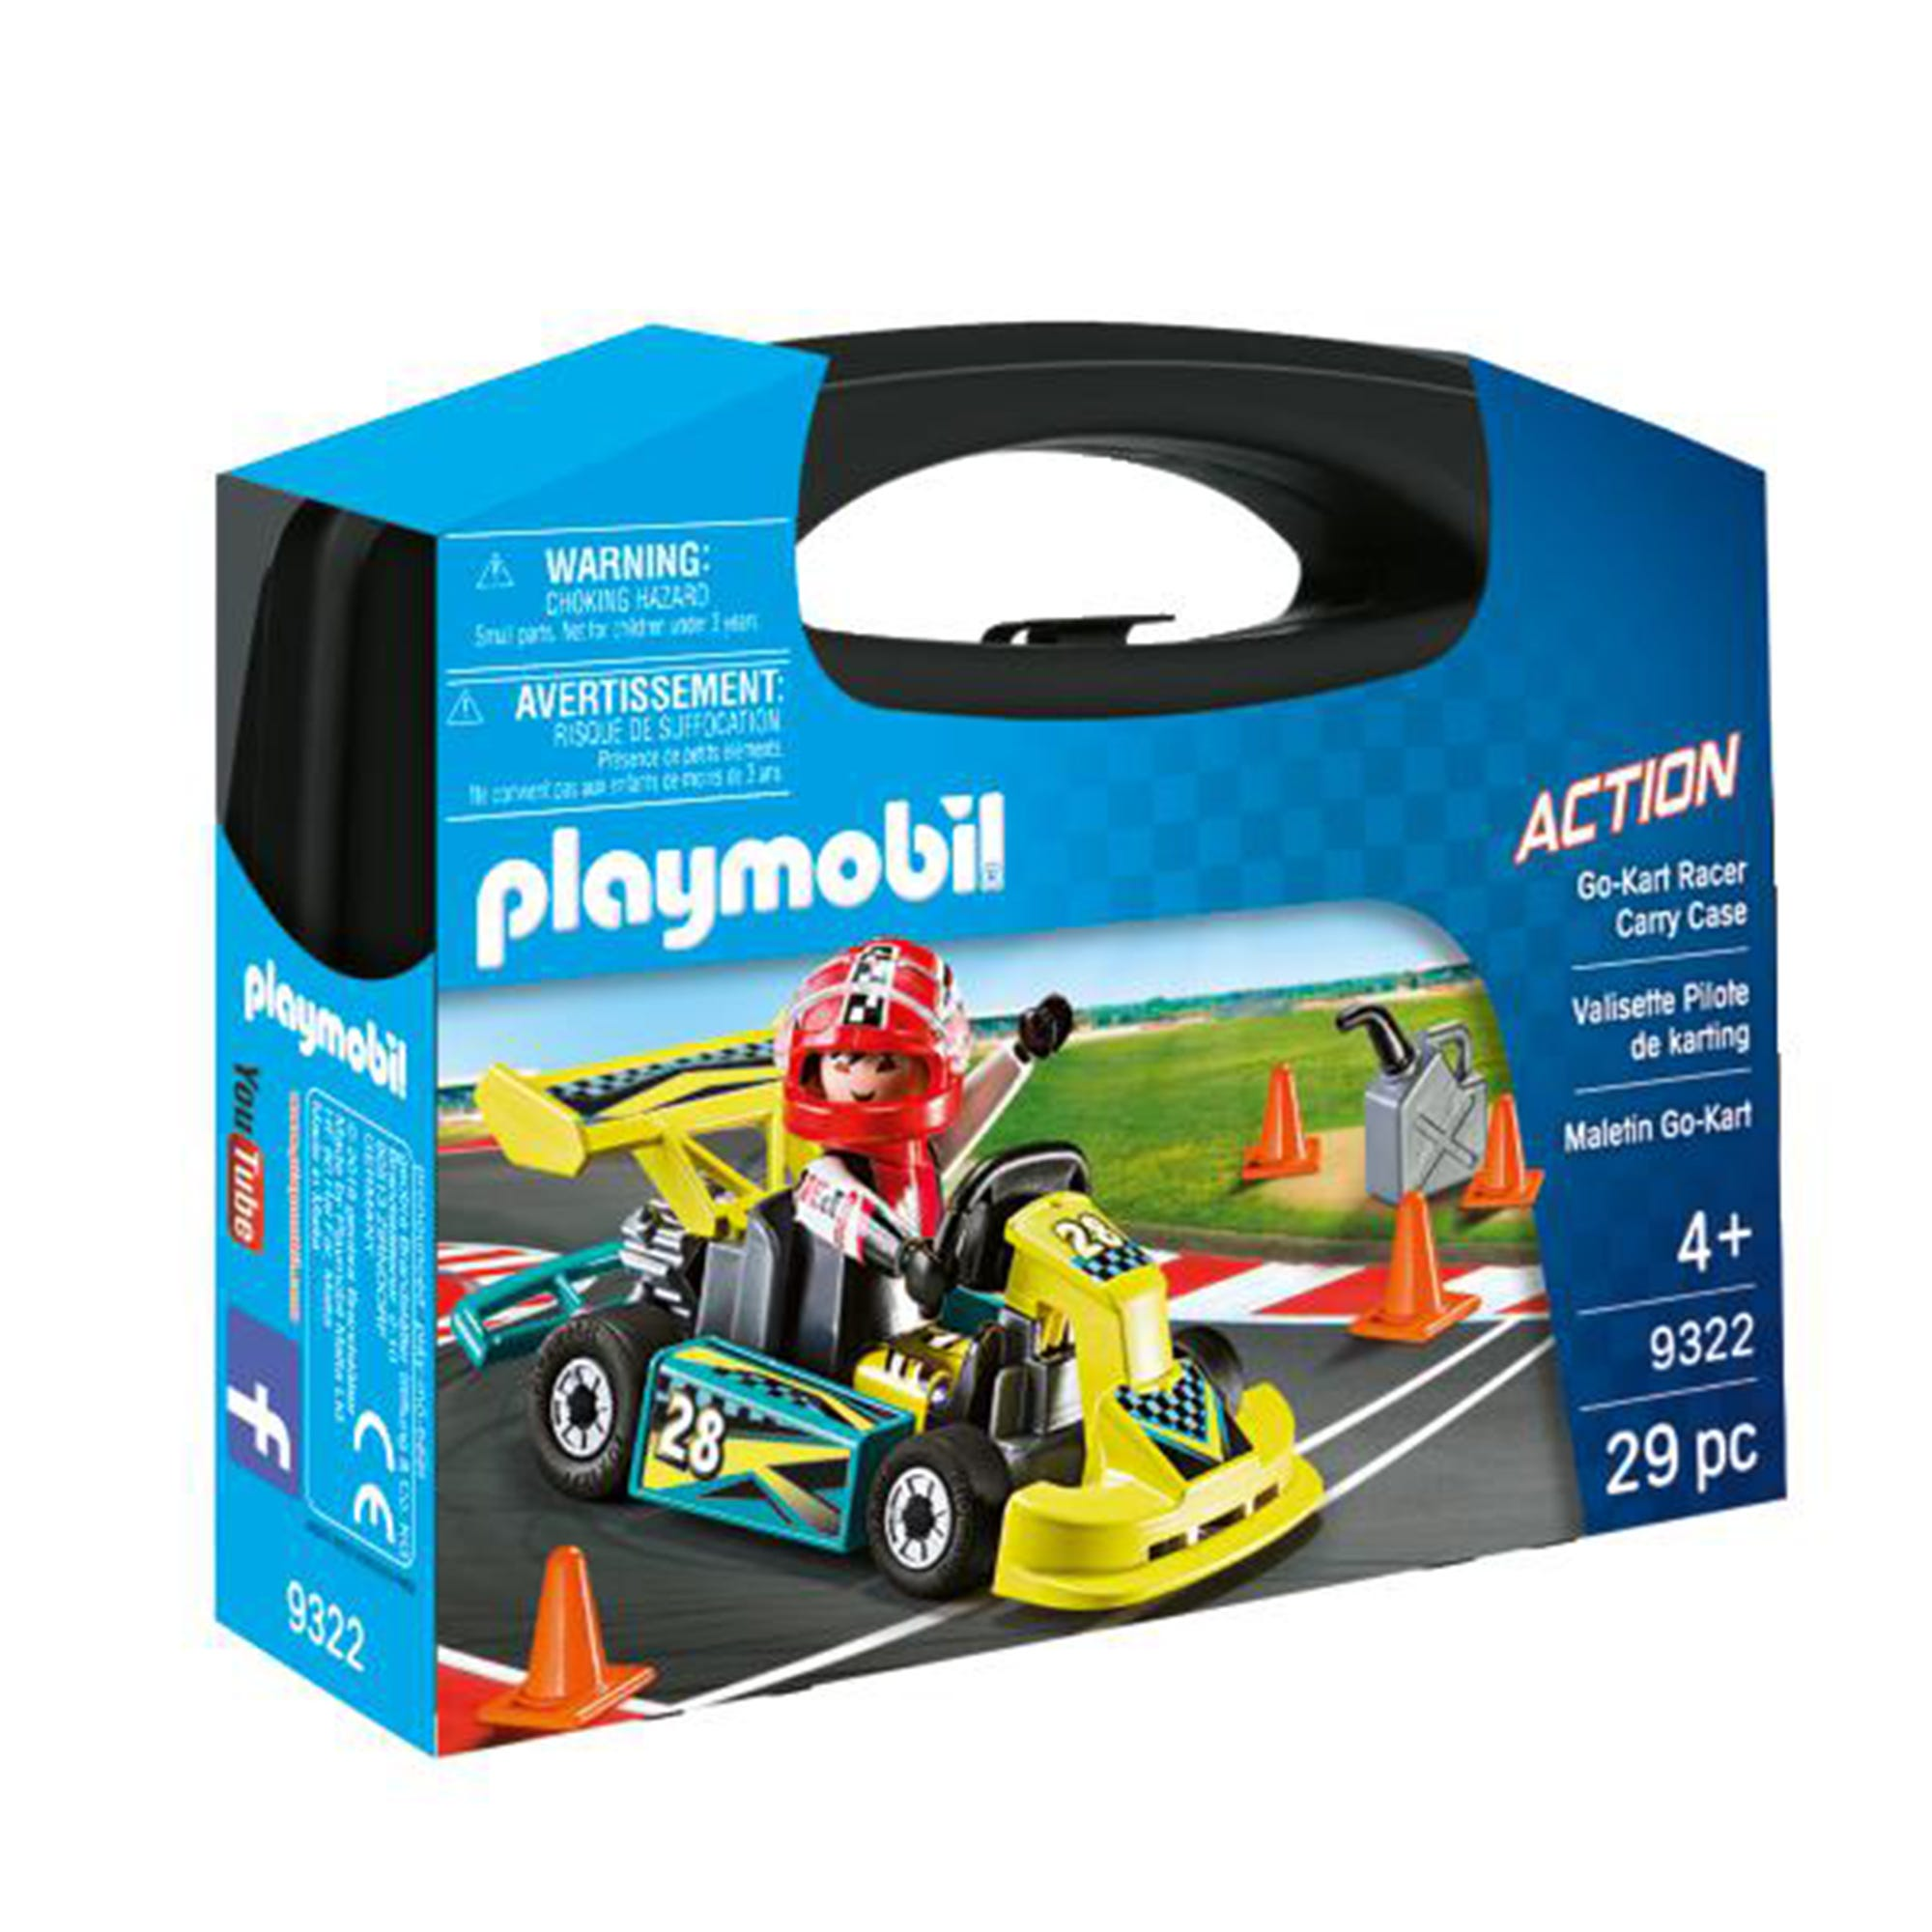 Playmobil Action Go Kart Racer Carry Case 9322